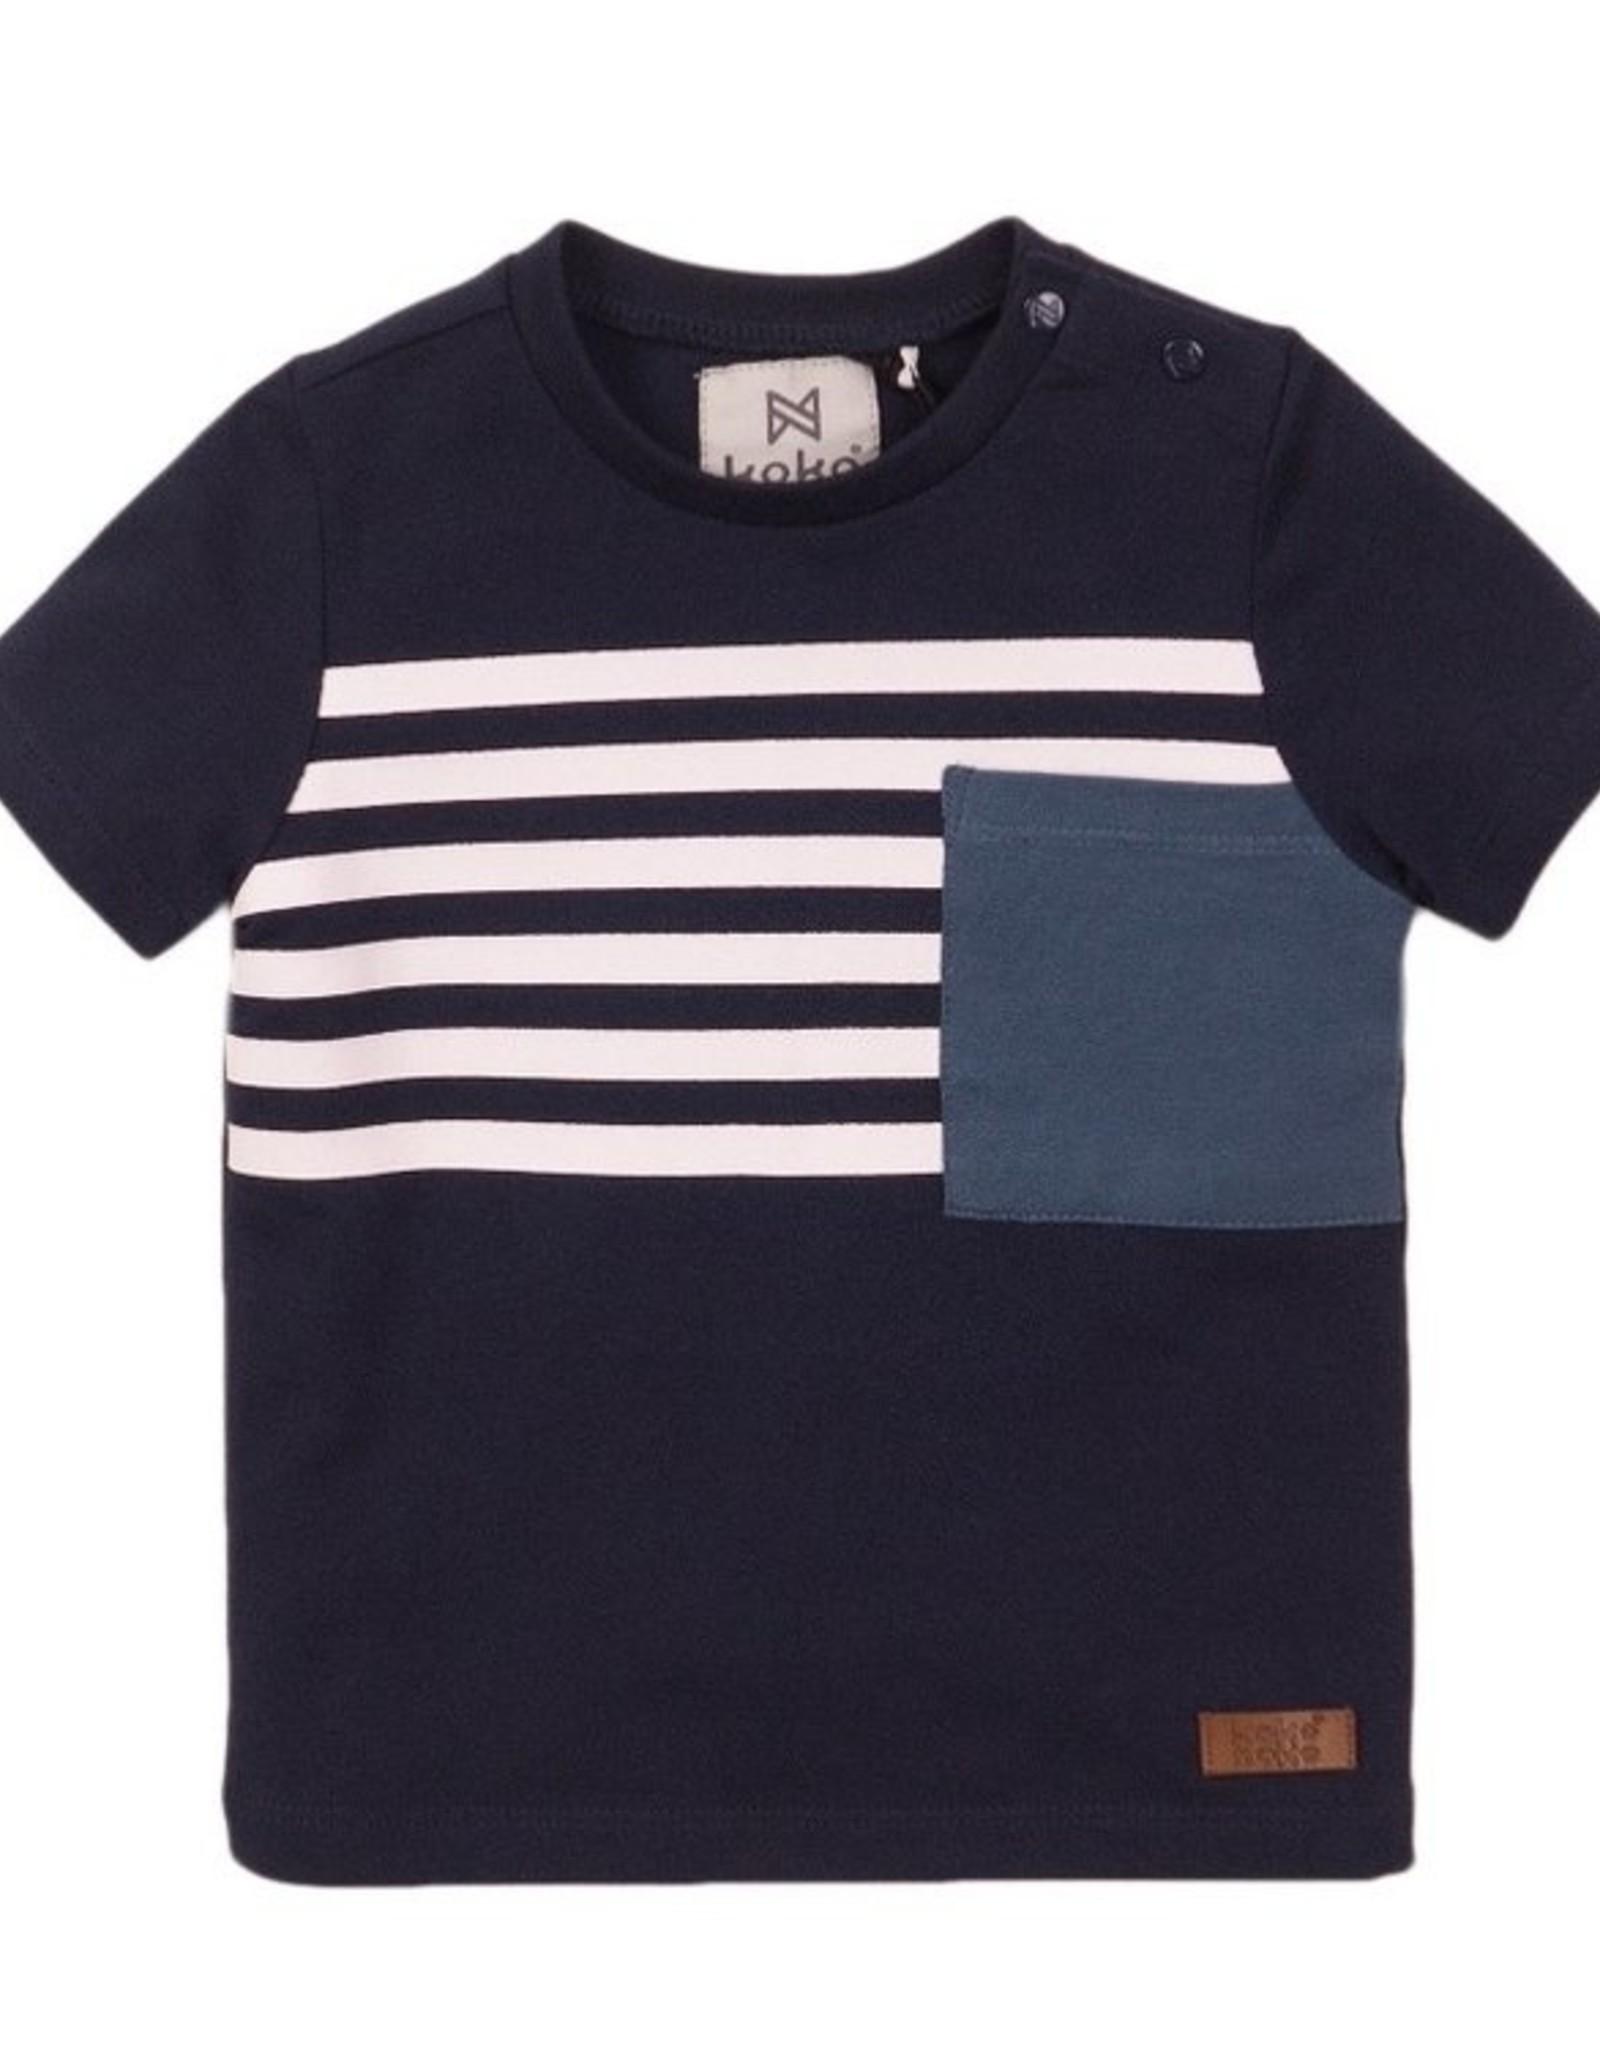 Koko Noko SP21 B Navy Stripe T-Shirt